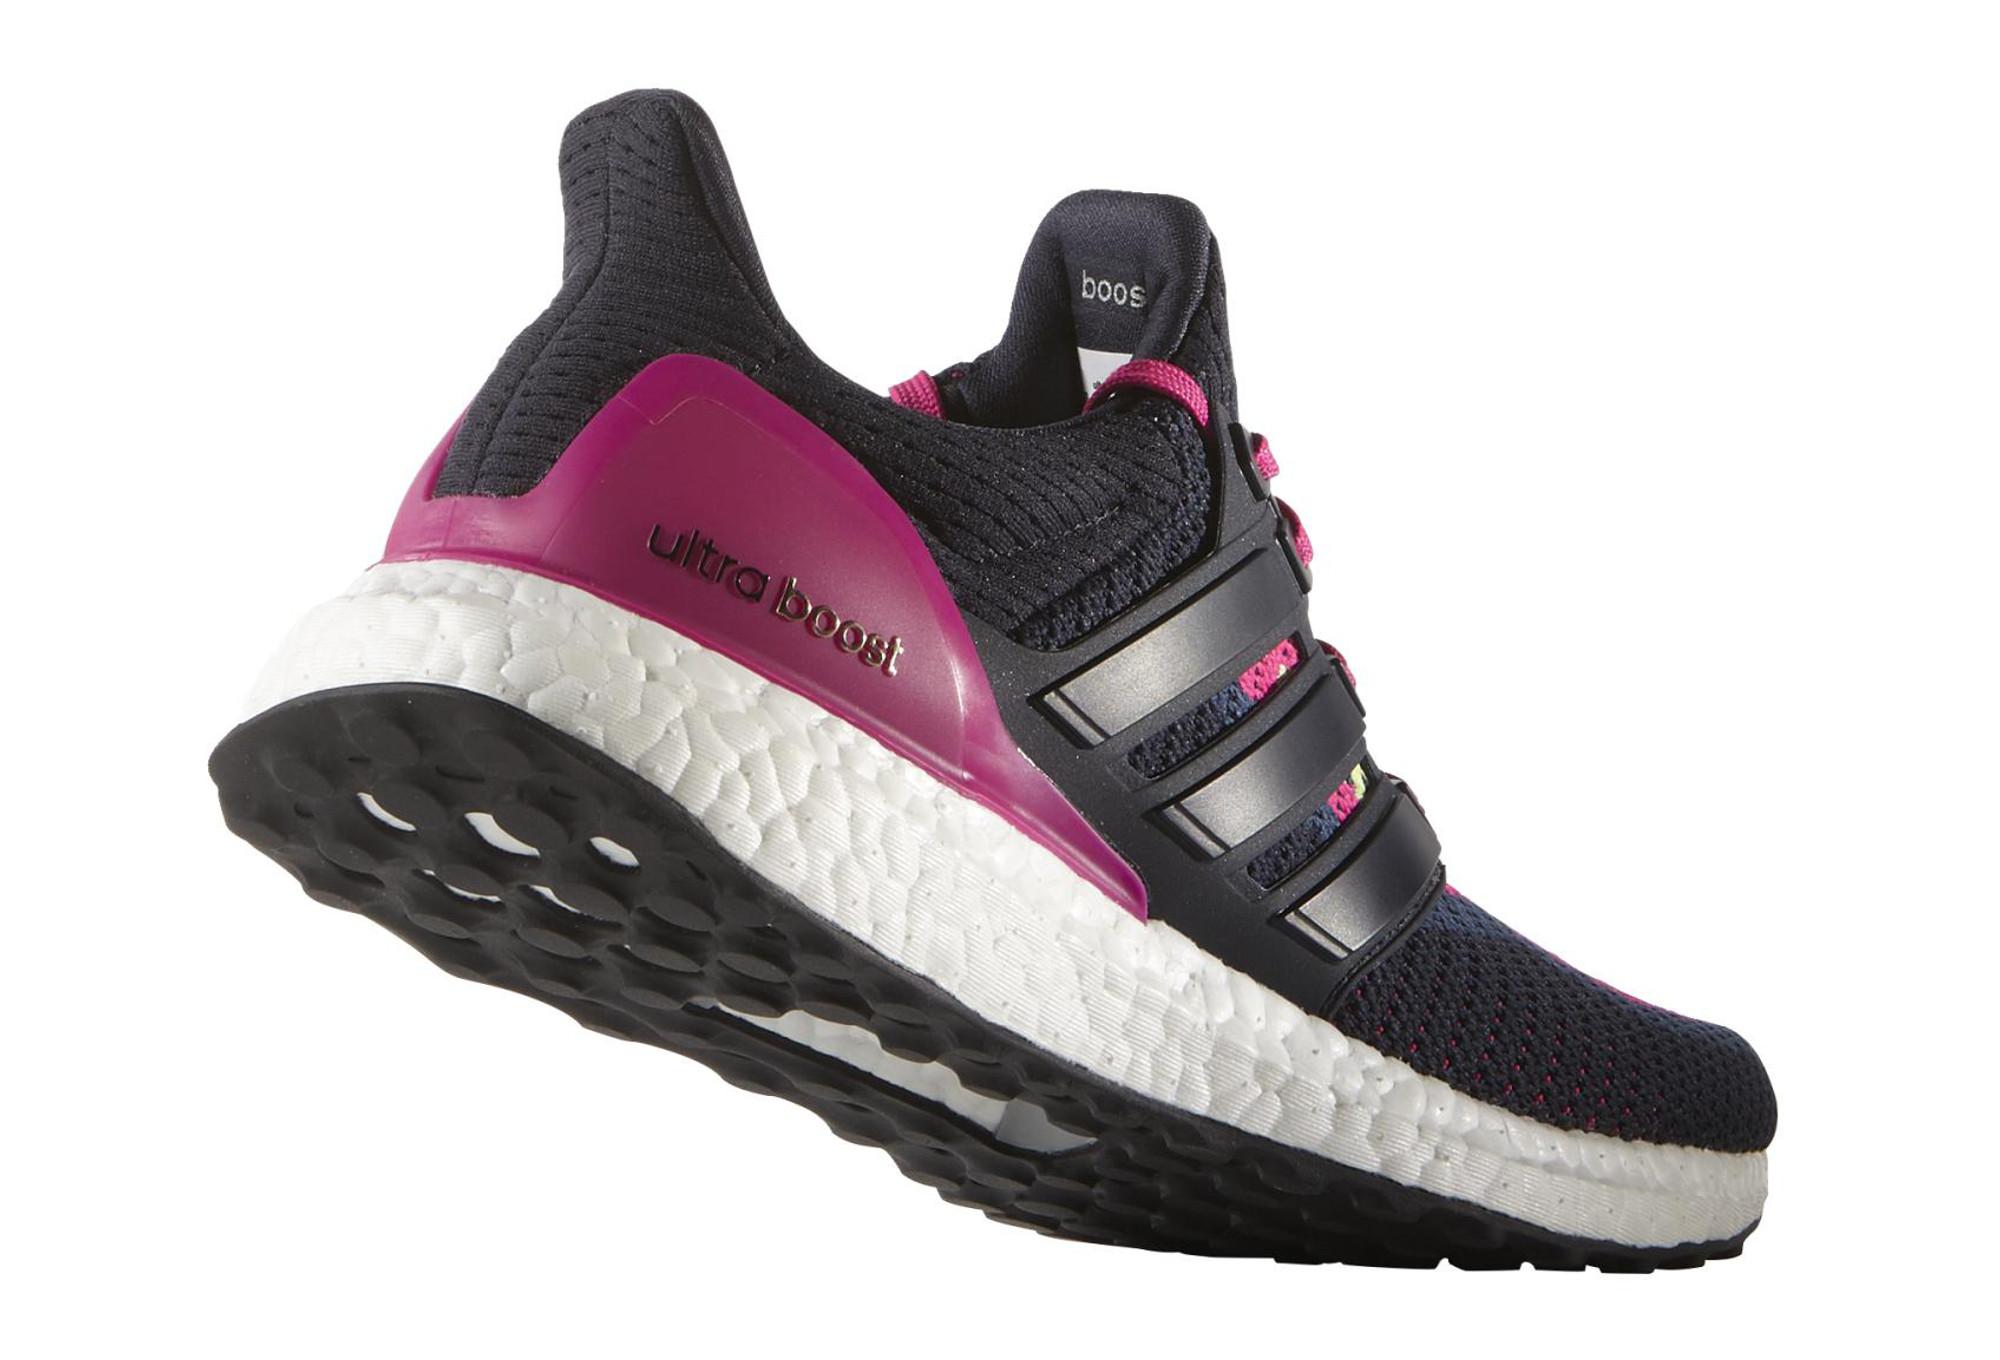 bd4dcf8e3 ... ADIDAS ULTRA BOOST Pair of Shoes Blue Purple Women ...